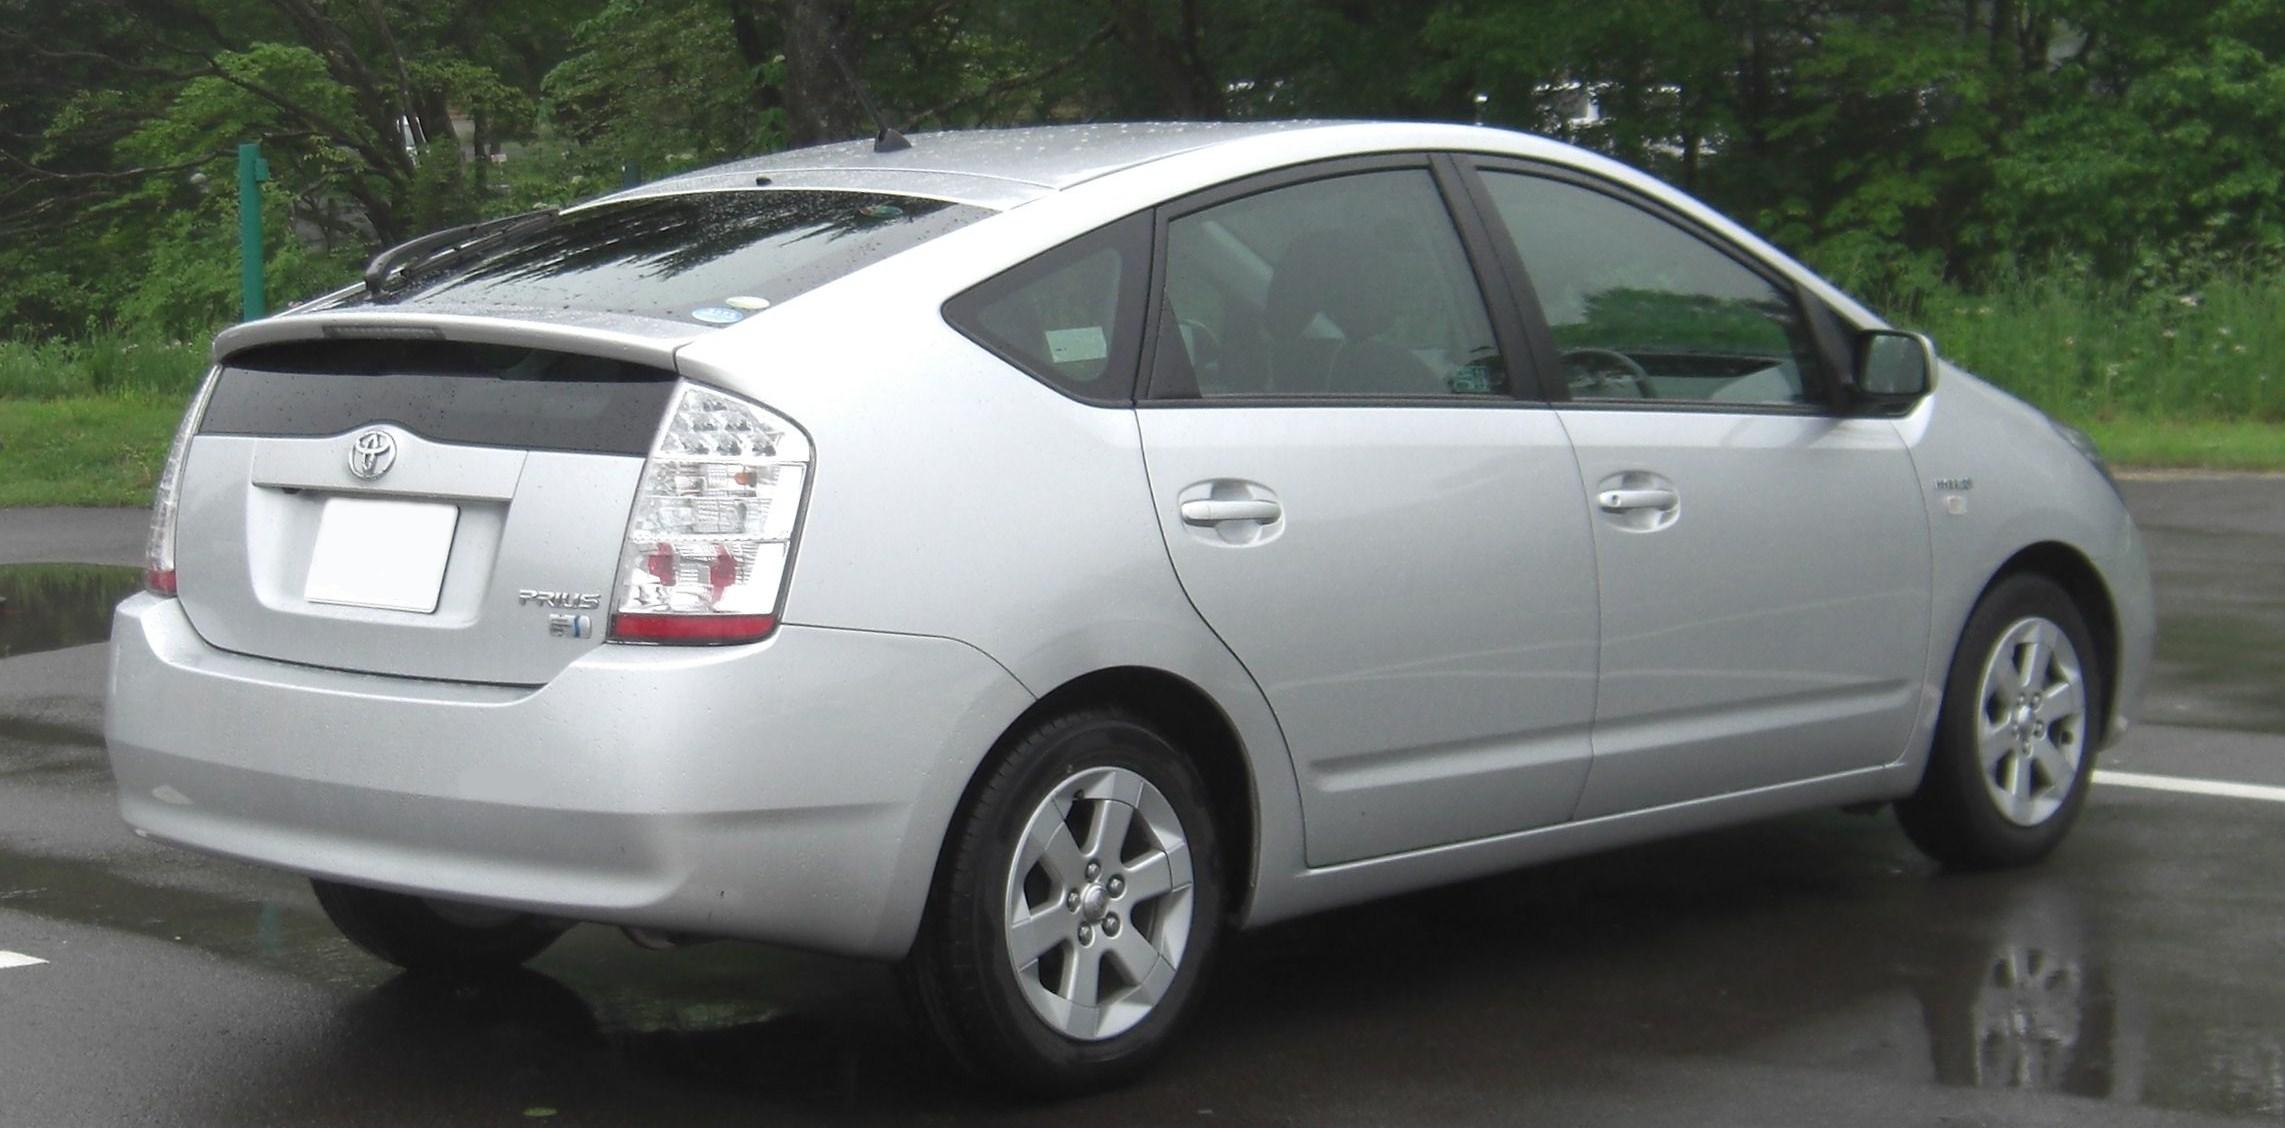 Toyota Prius NHW20 rear.jpg